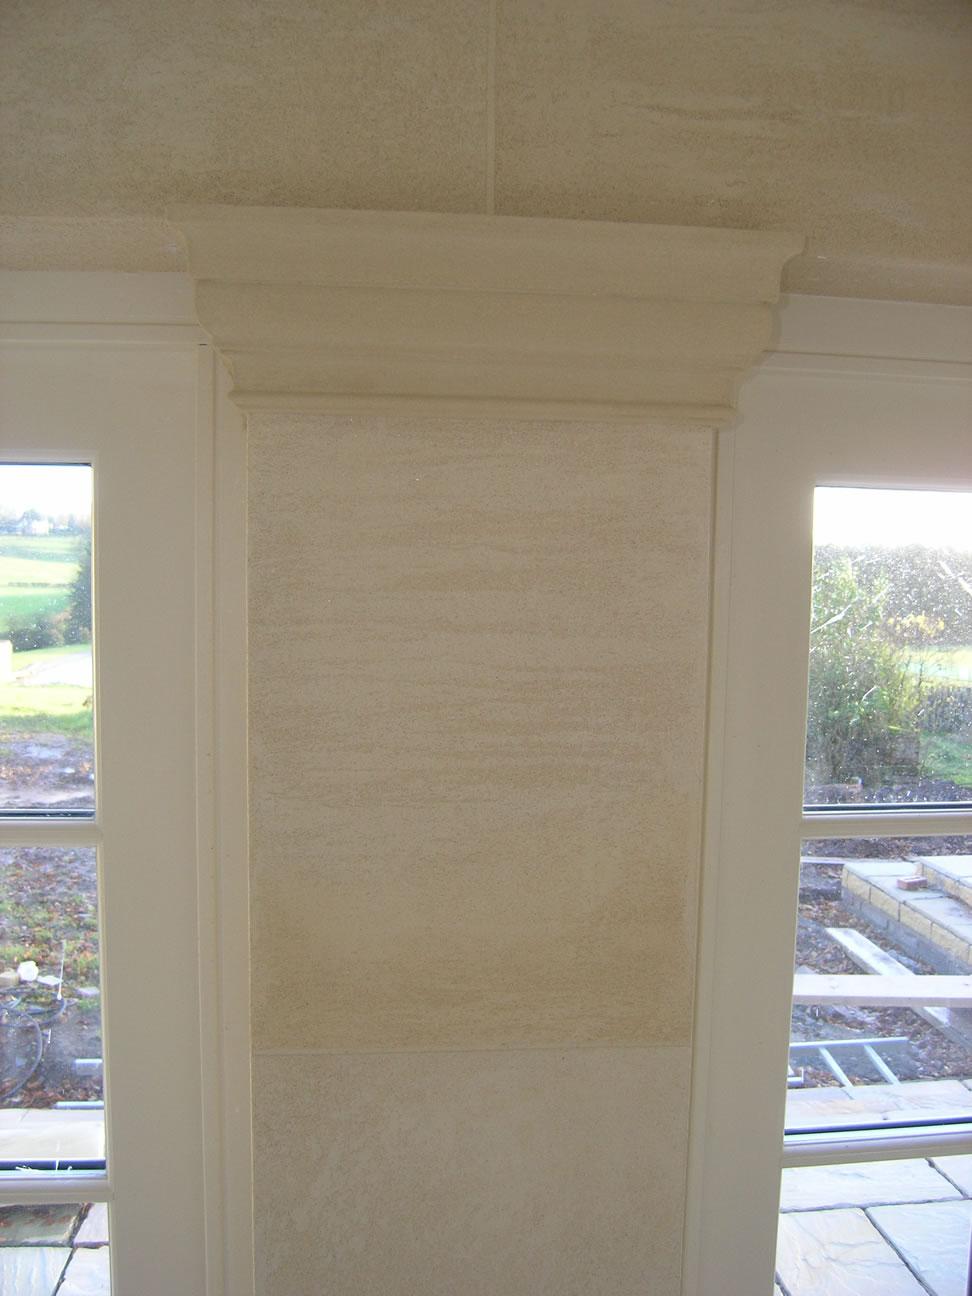 Decorative Stone Block Finishes Glasgow Scotland Sam